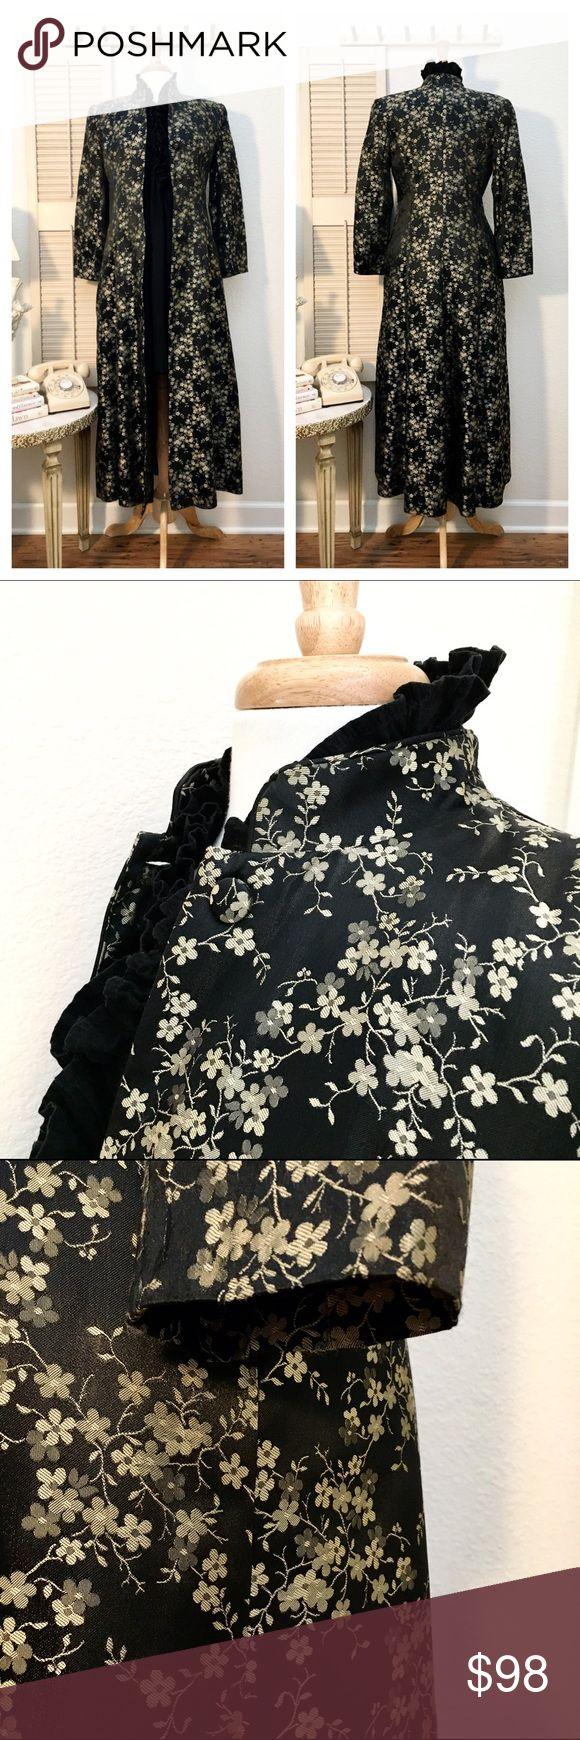 Jessica McClintock Cherry Blossom Print Duster❤ Details and measurements to follow... Jessica McClintock Jackets & Coats